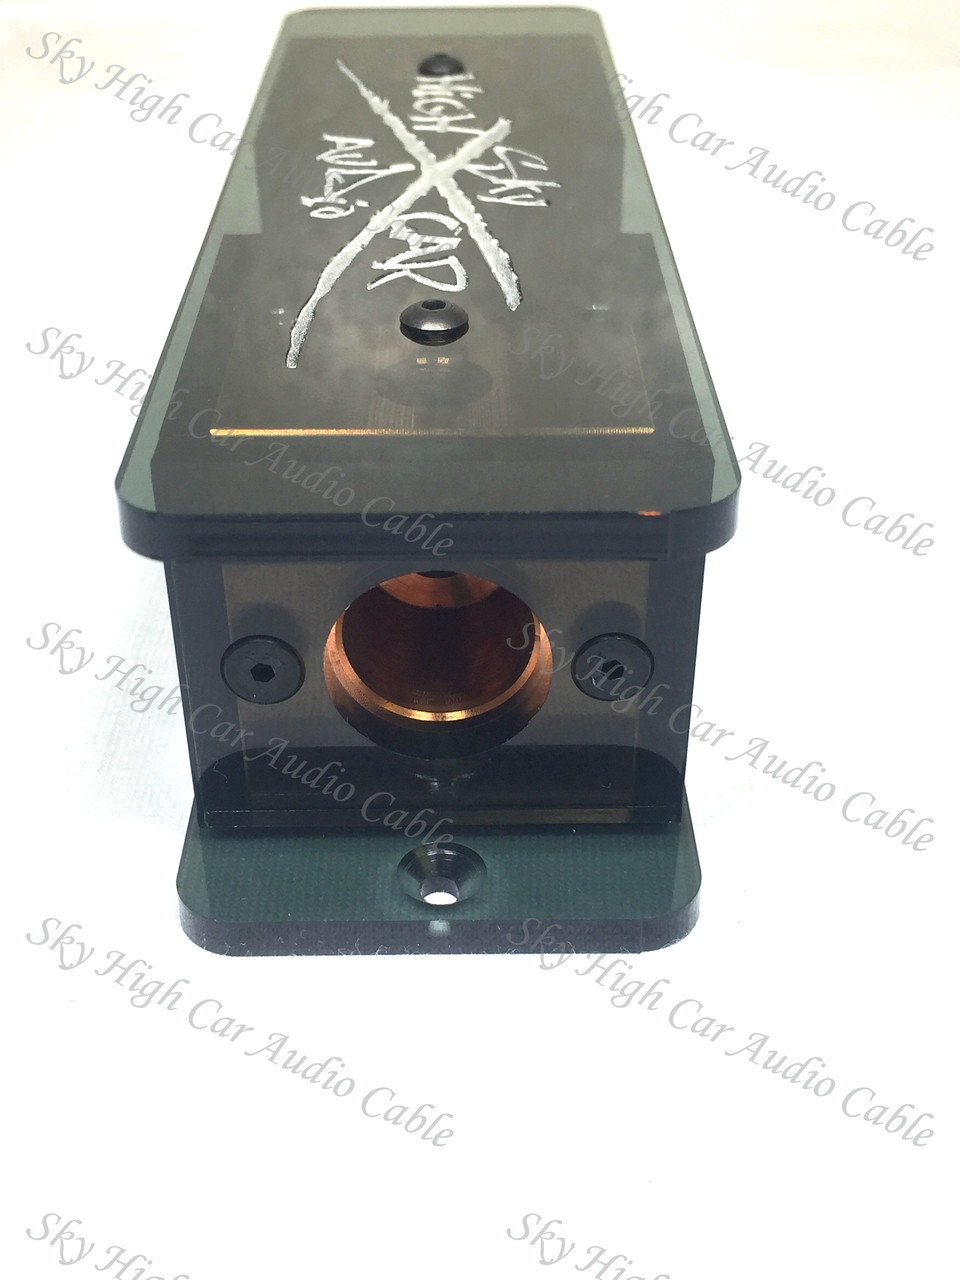 hight resolution of  sky high car audio copper 2 0 anl fuse holder set screw